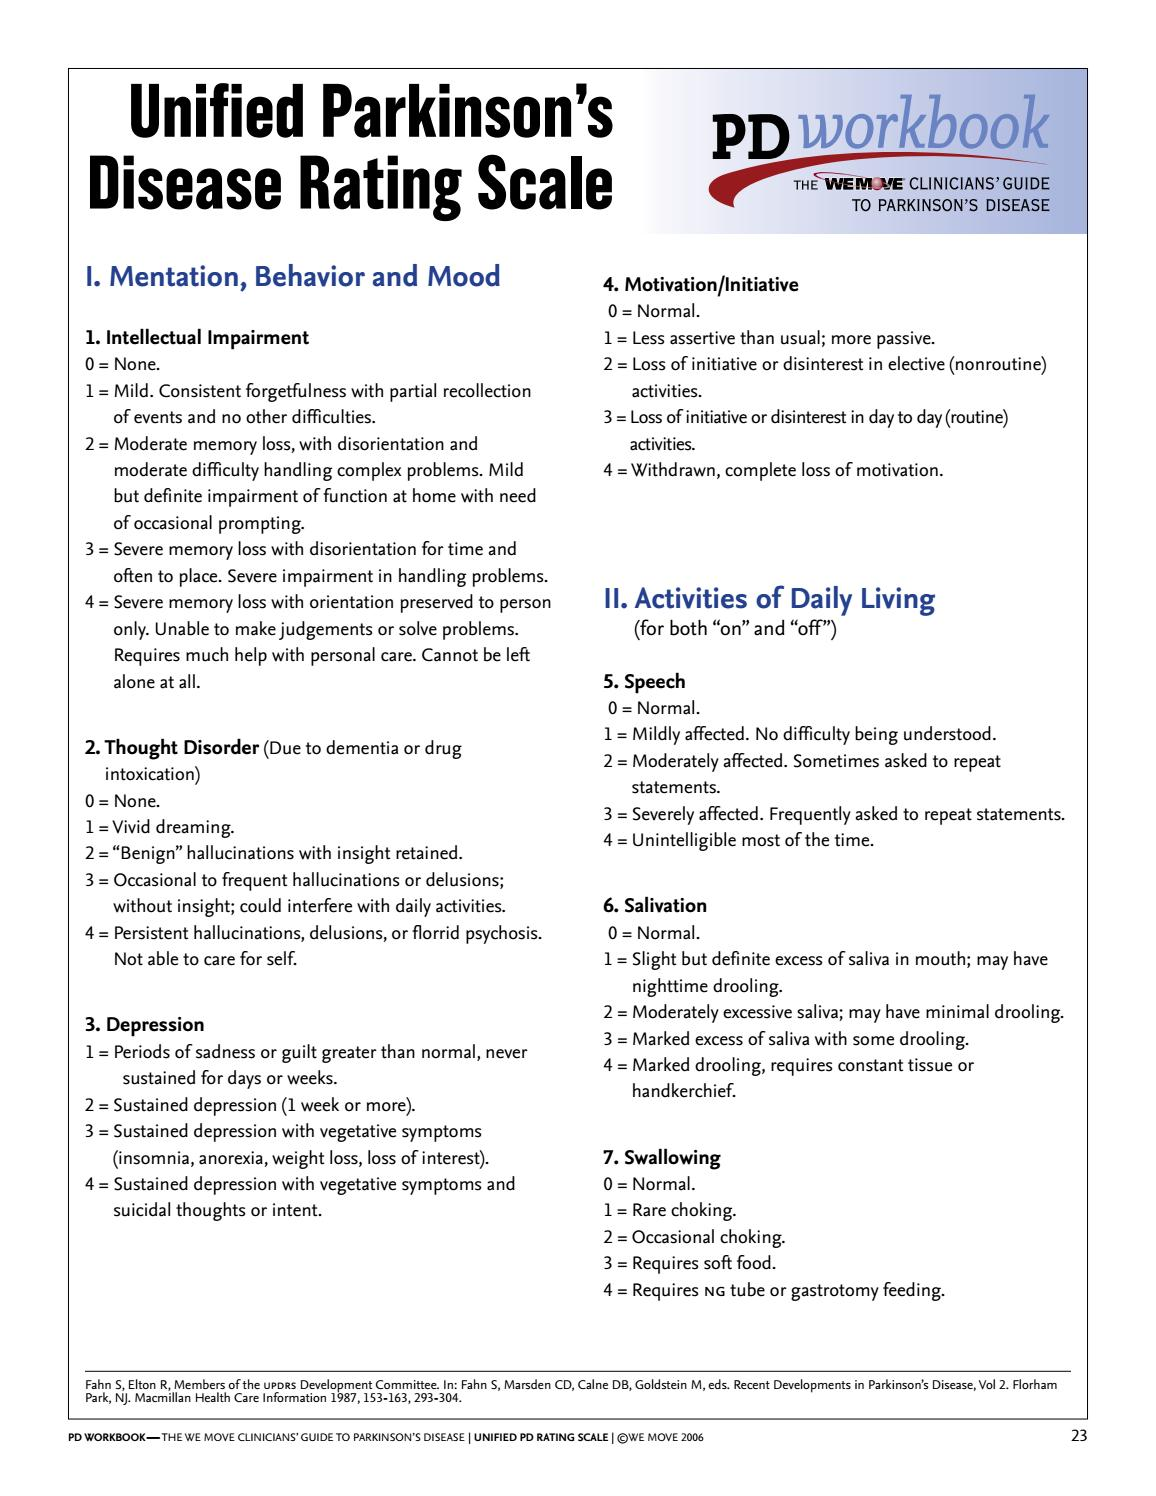 is weight loss a symptom of parkinson disease